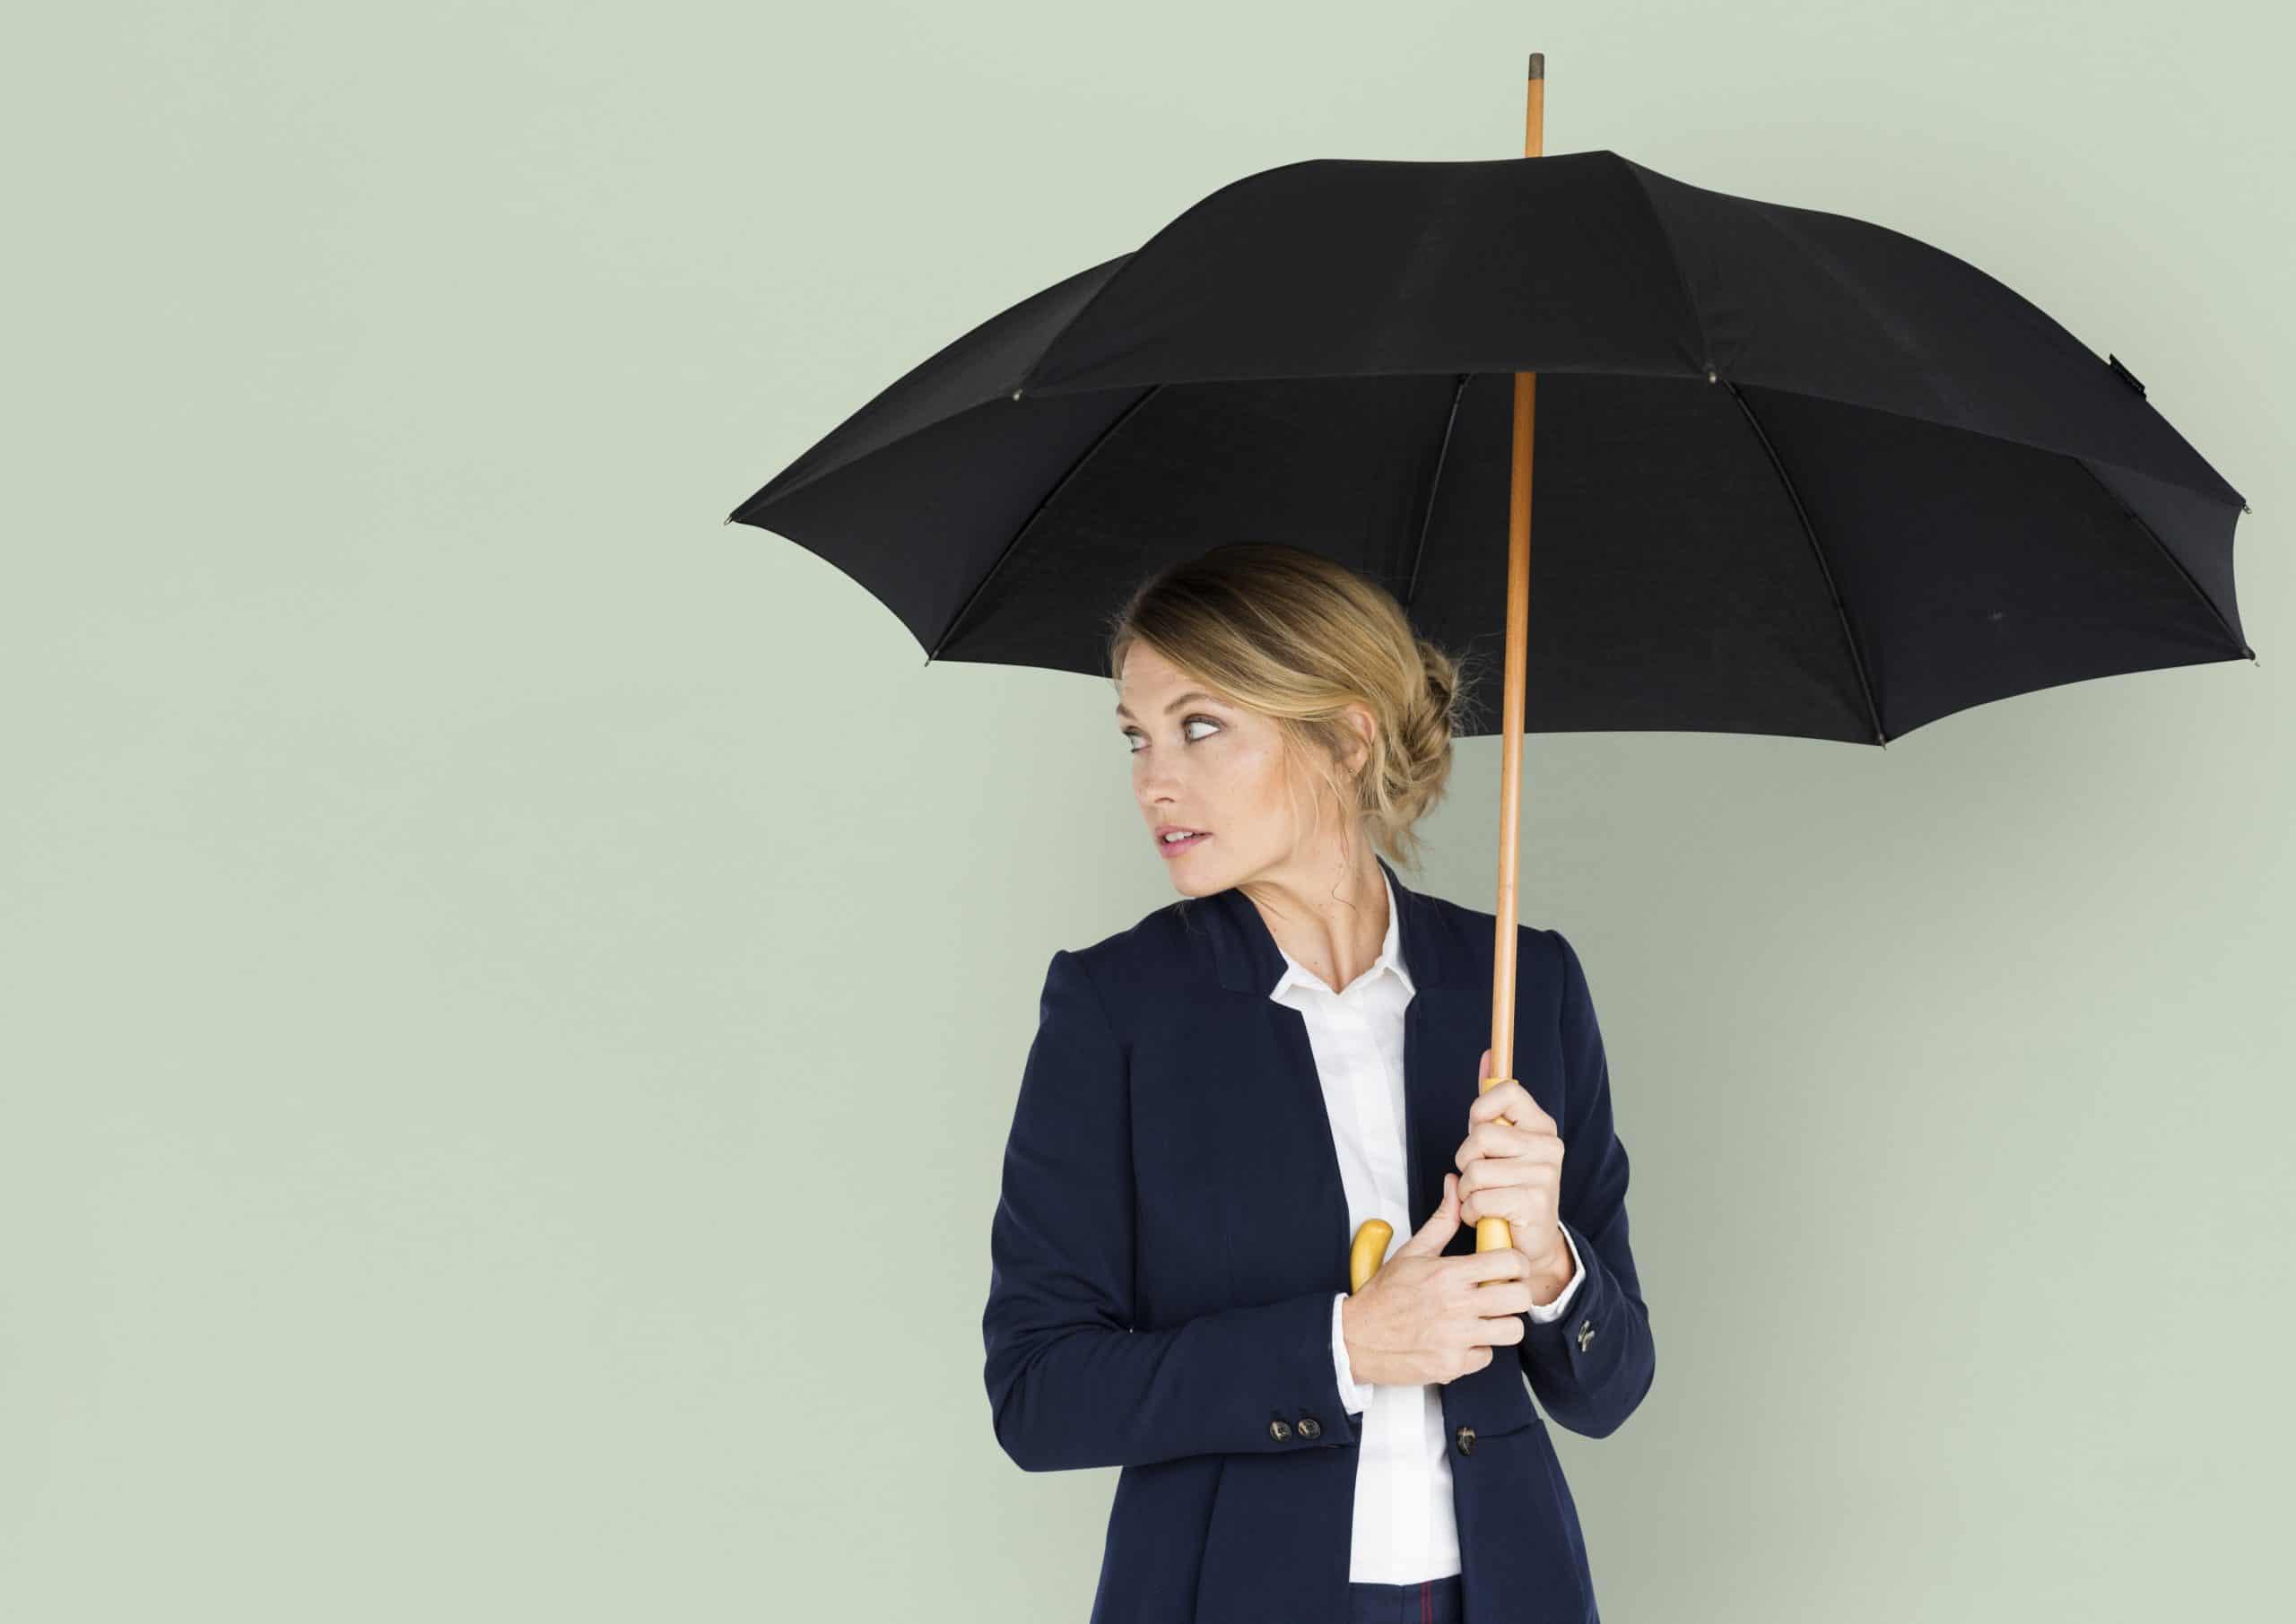 contractor umbrella